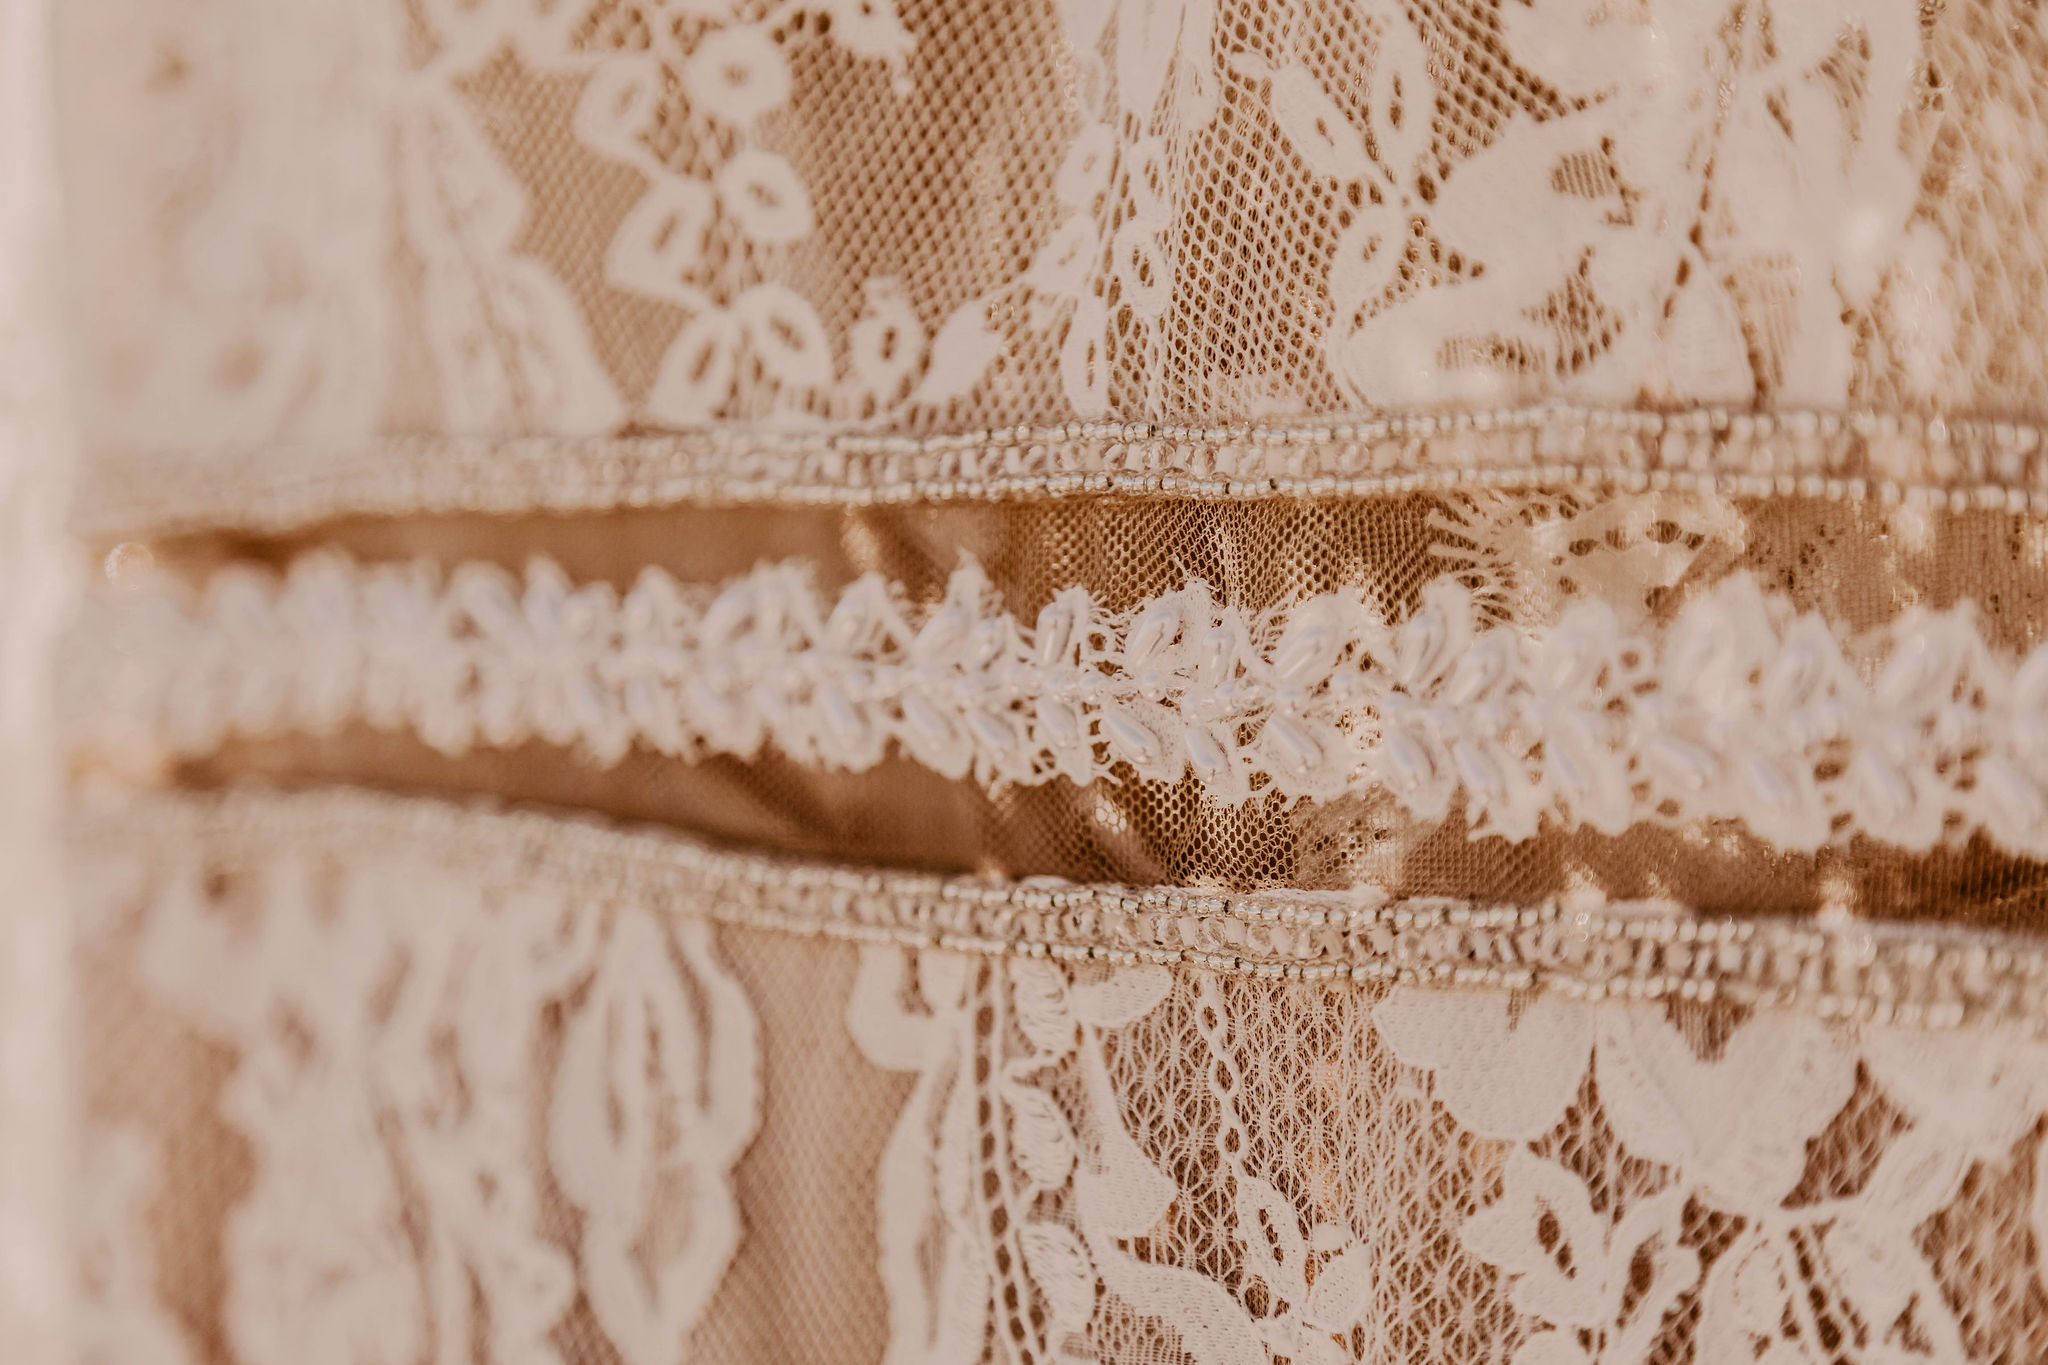 beaded gown spokane bridal shop wedding